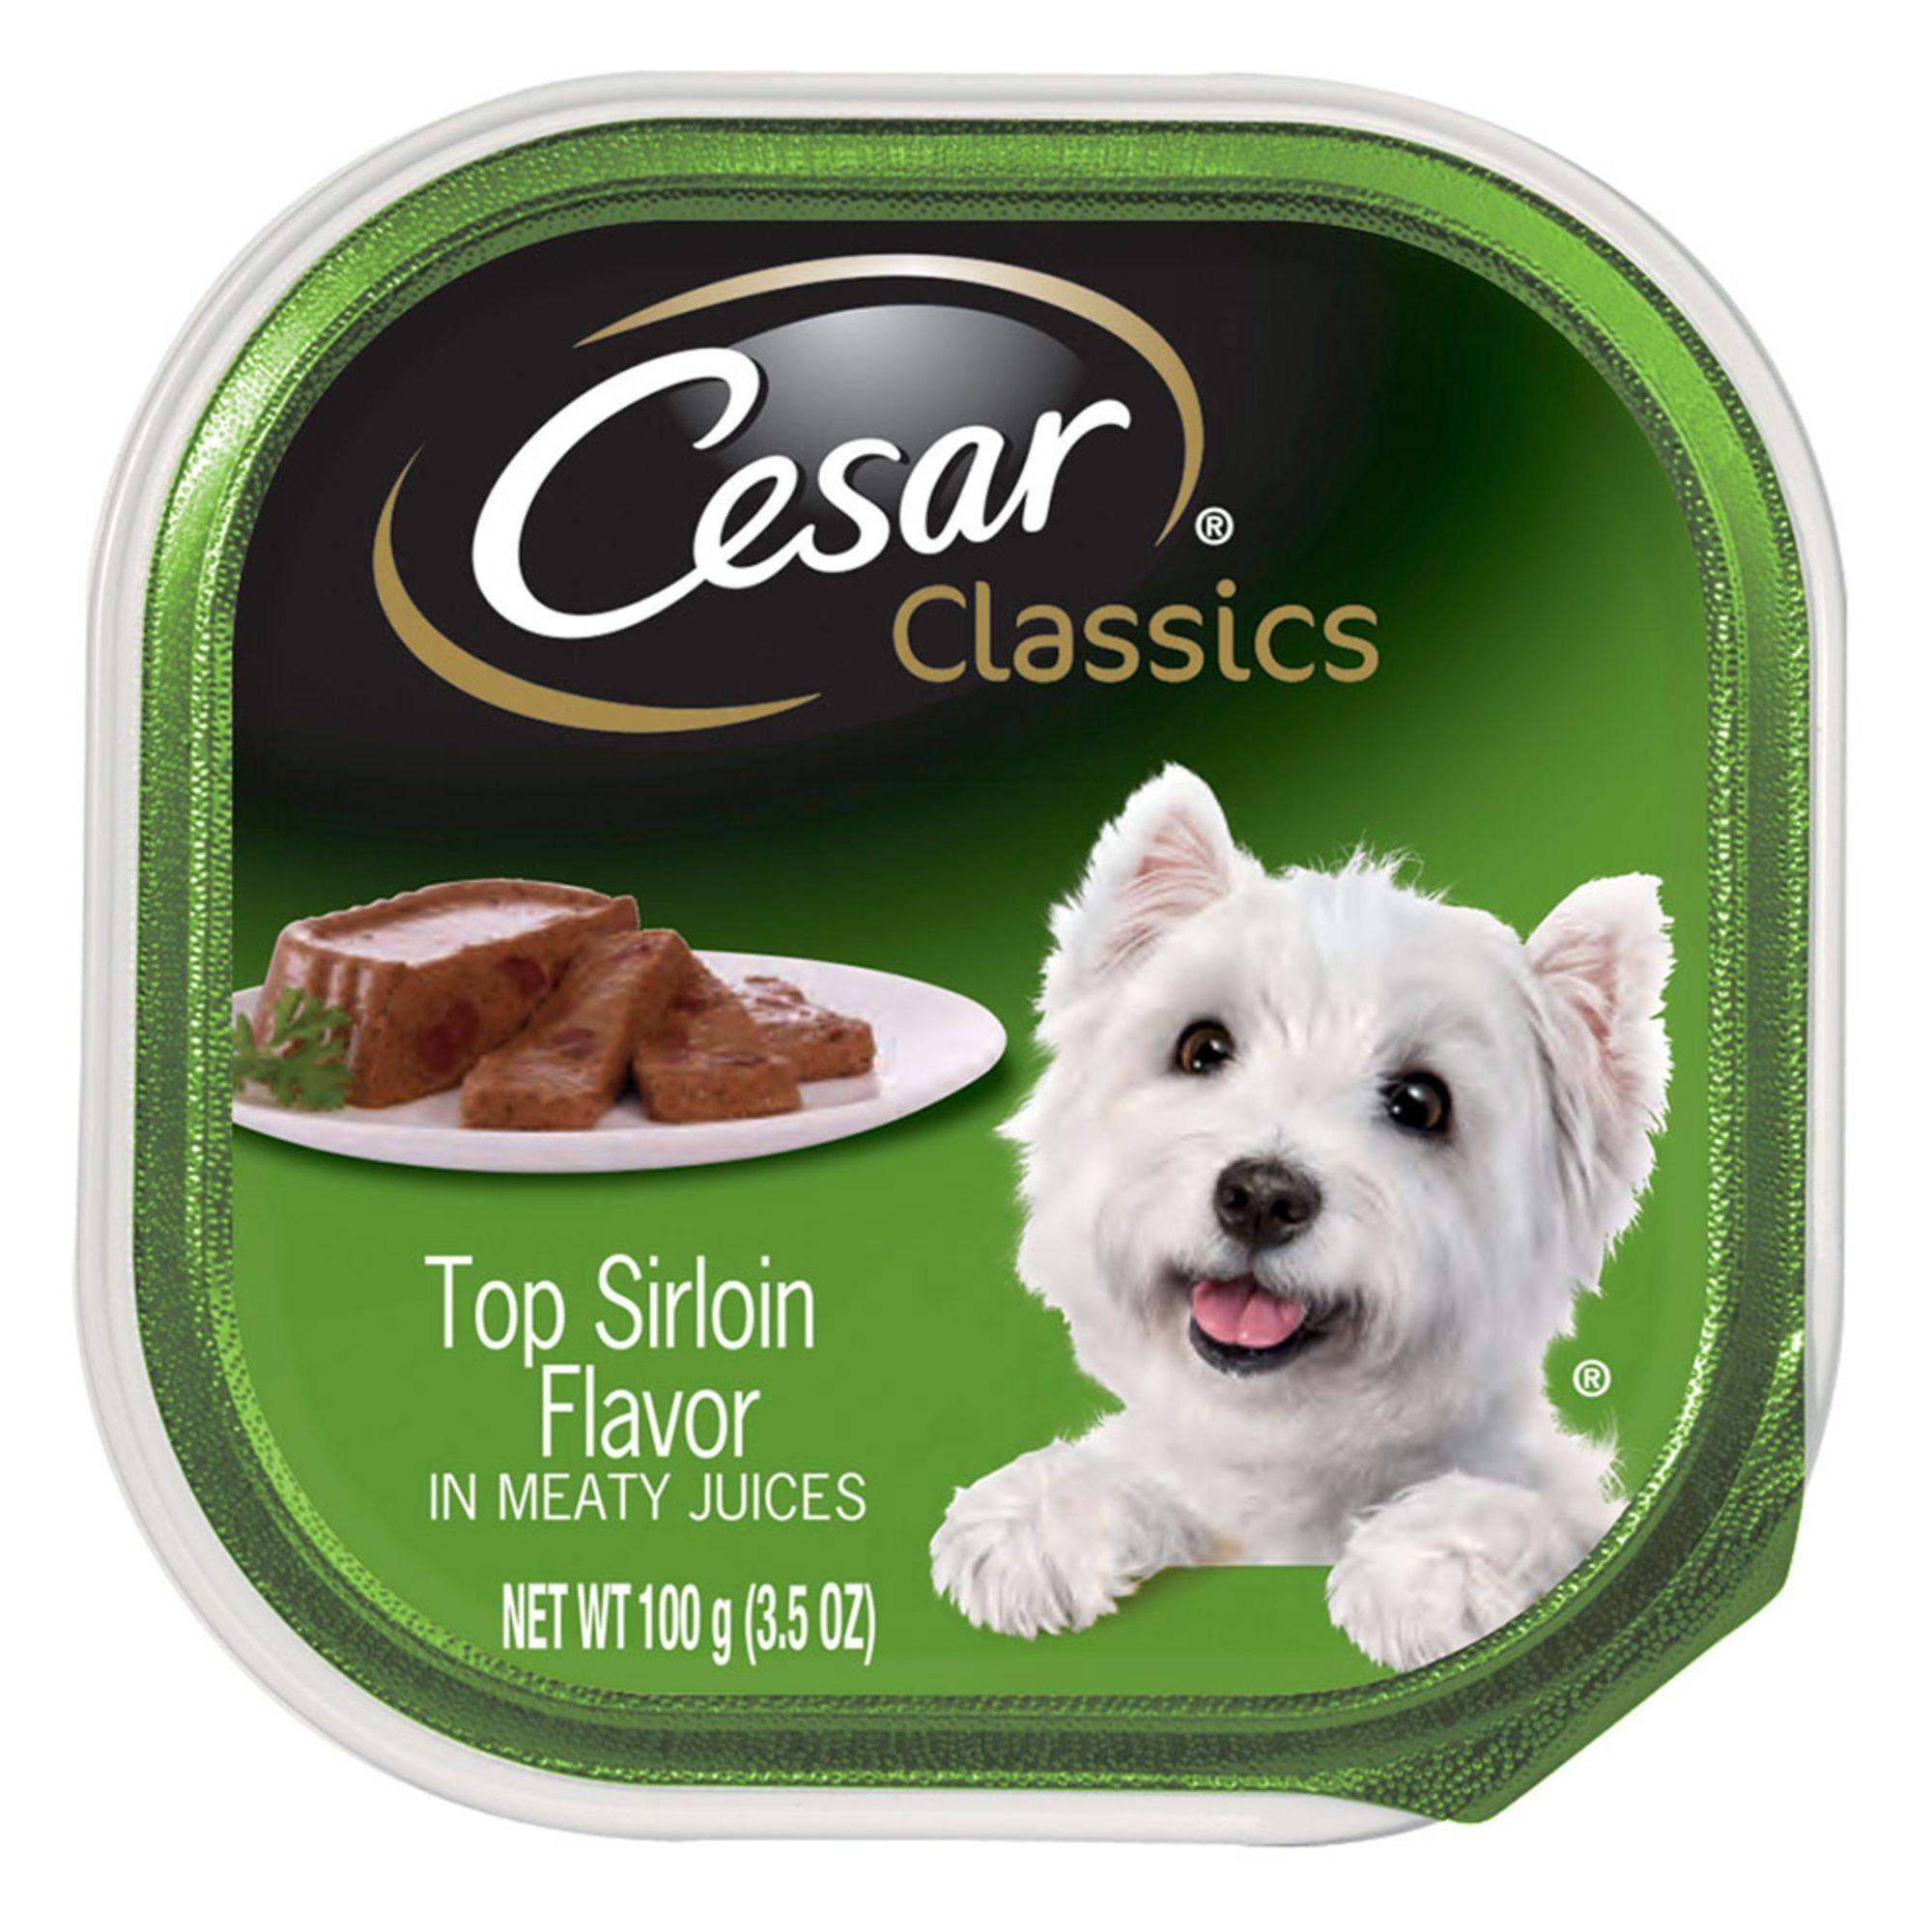 Cesar® Canine Cuisine Adult Dog Food size: 3.5 Oz